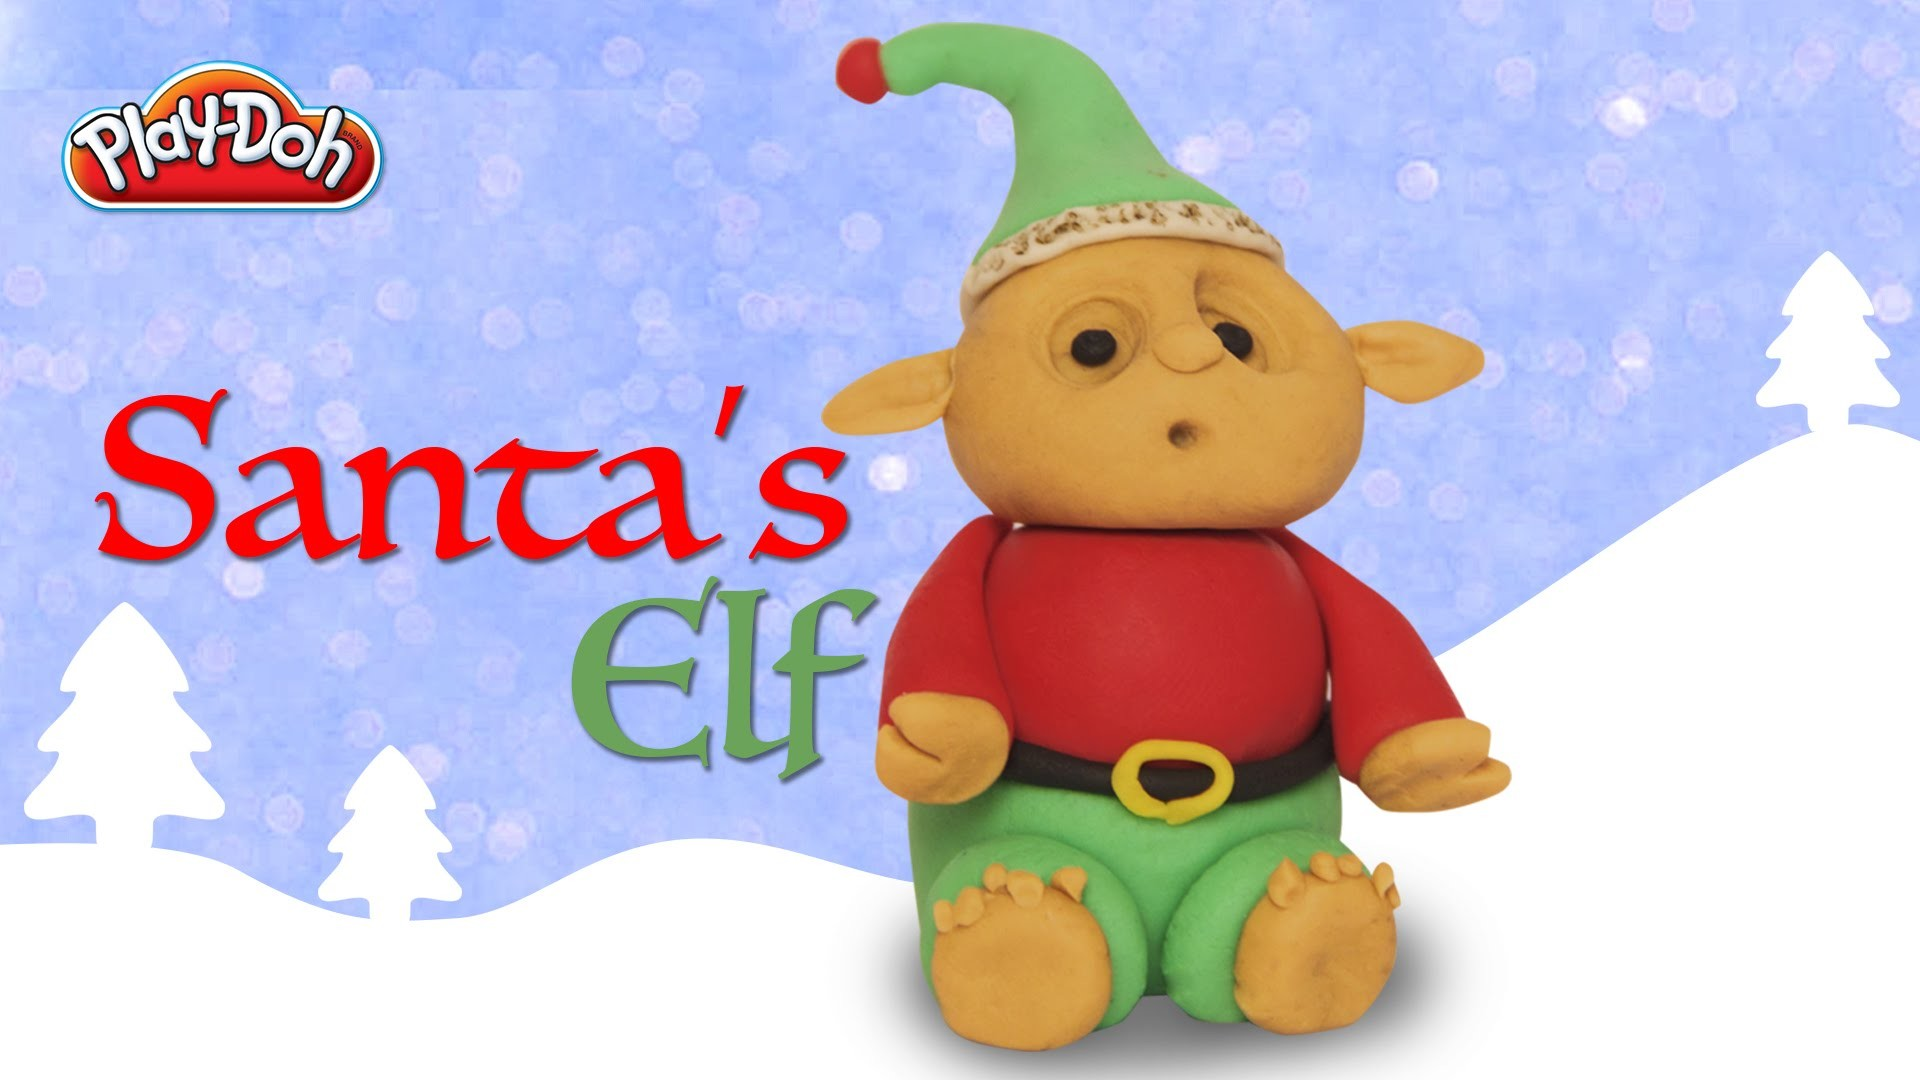 Play Doh Santa's Elf | Elf | Christmas Special | How To Make Play Doh Santa's Elf